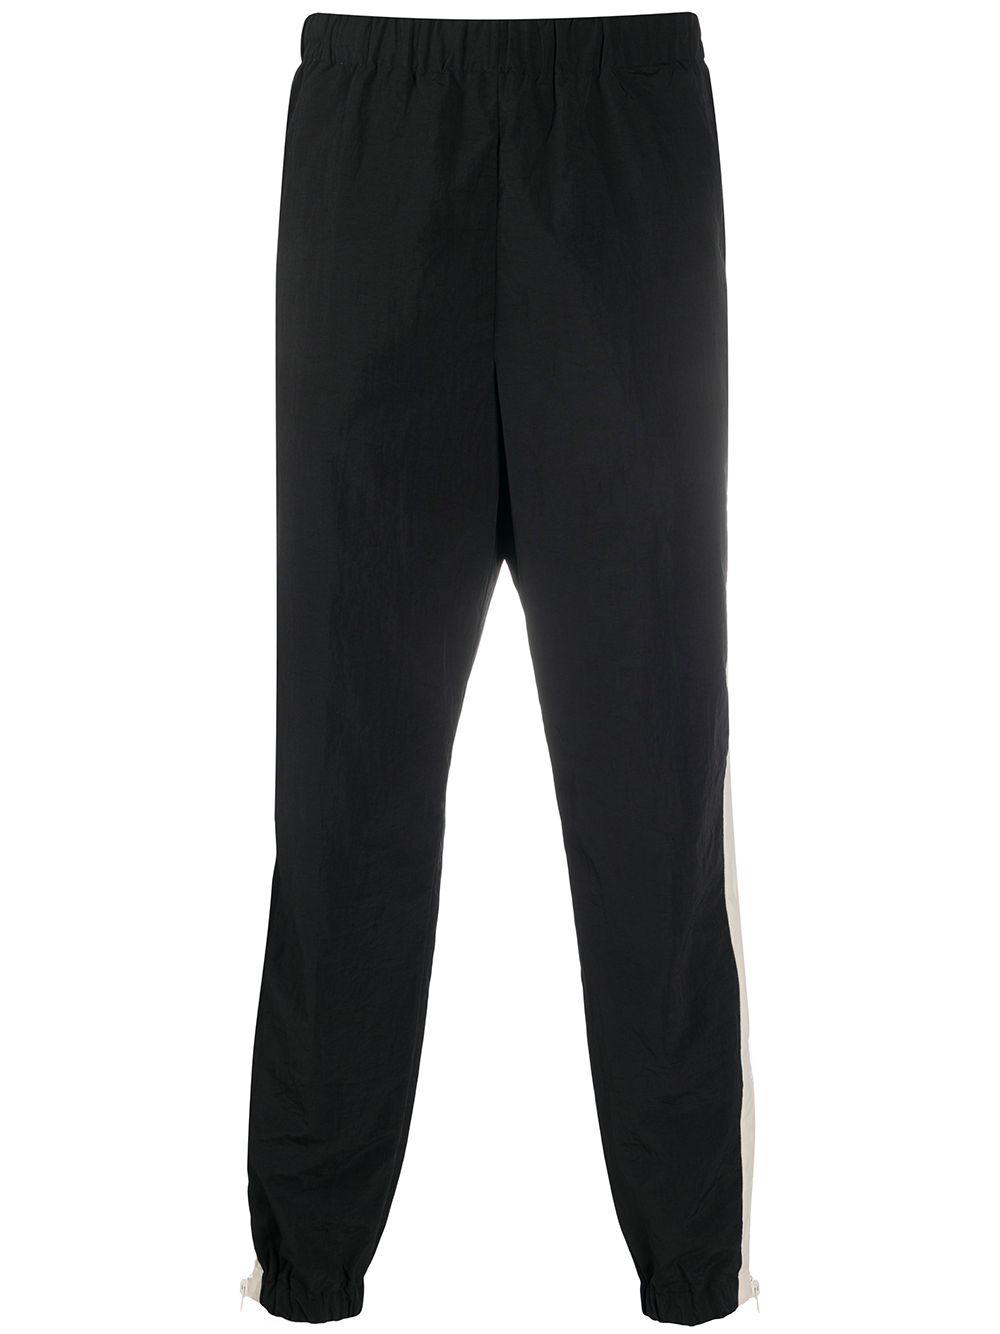 Kenzo Sporthose im Windbreaker-Stil - Schwarz